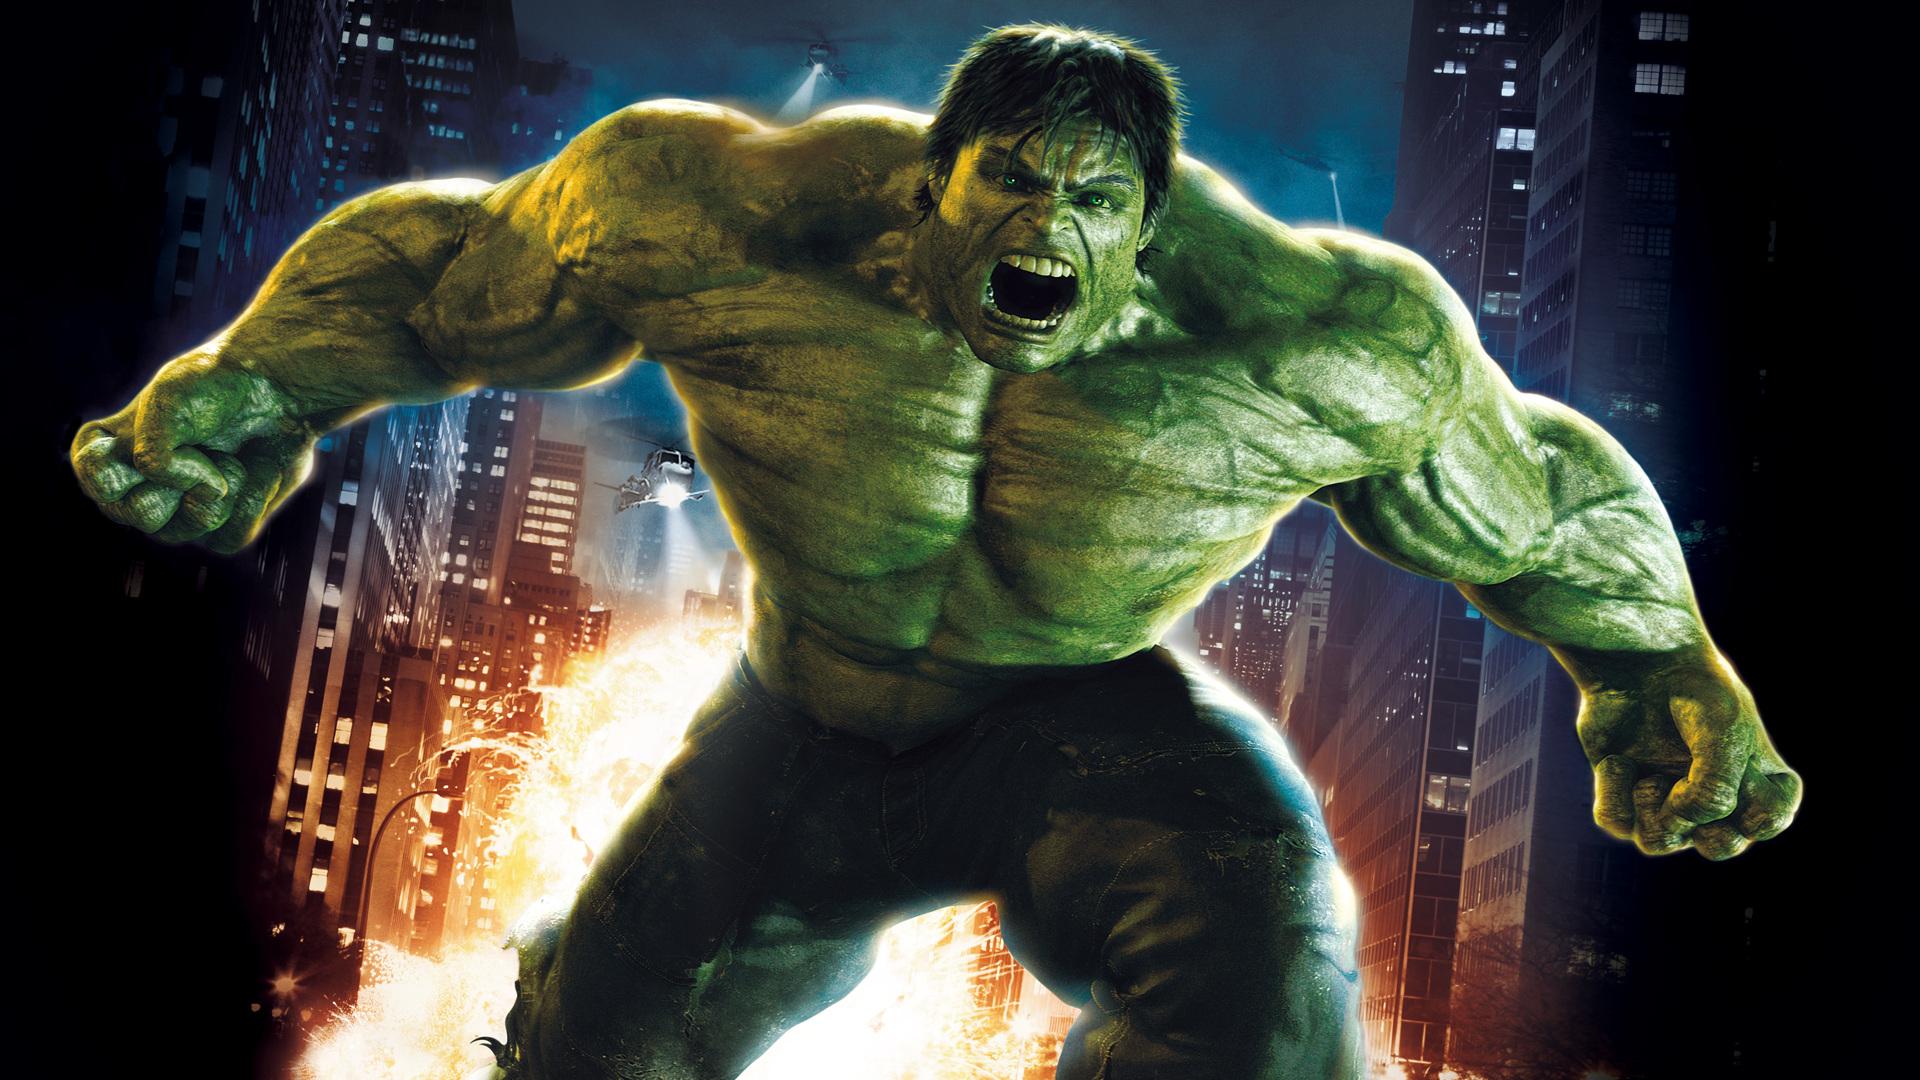 The Incredible Hulk Green HD Wallpaper 1920x1080